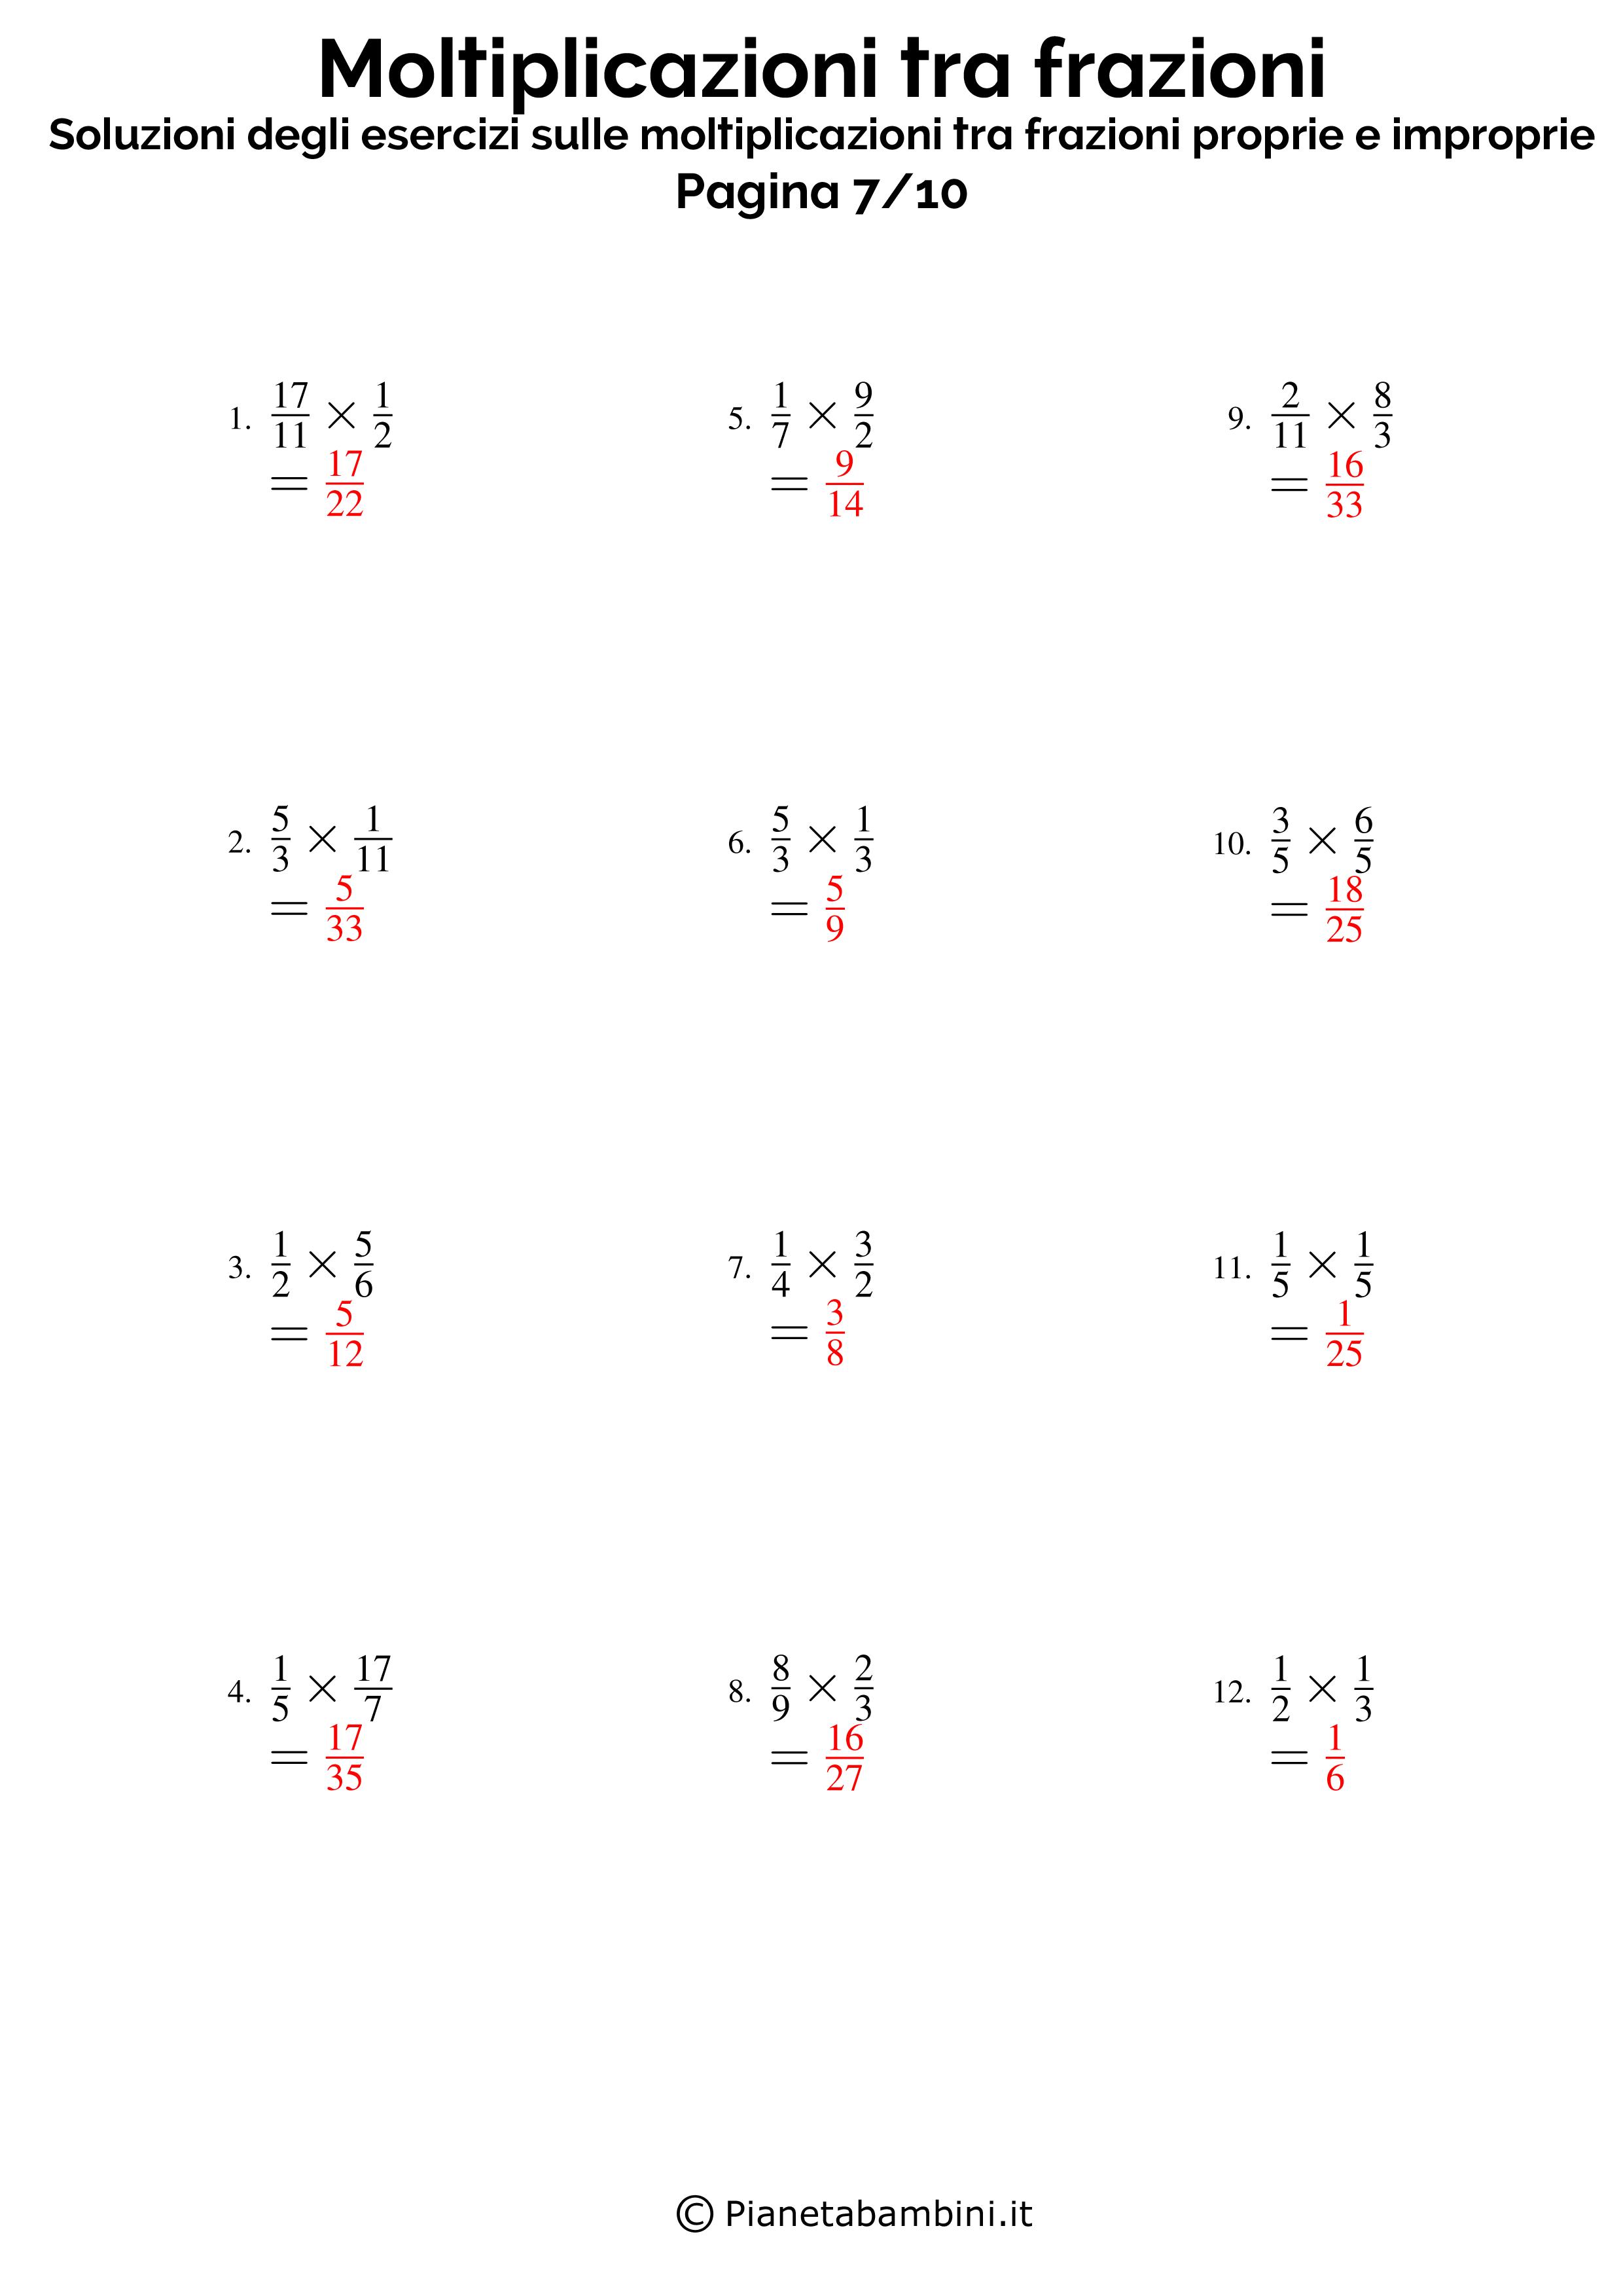 Soluzioni-Moltiplicazioni-Frazioni-Proprie-Improprie_07